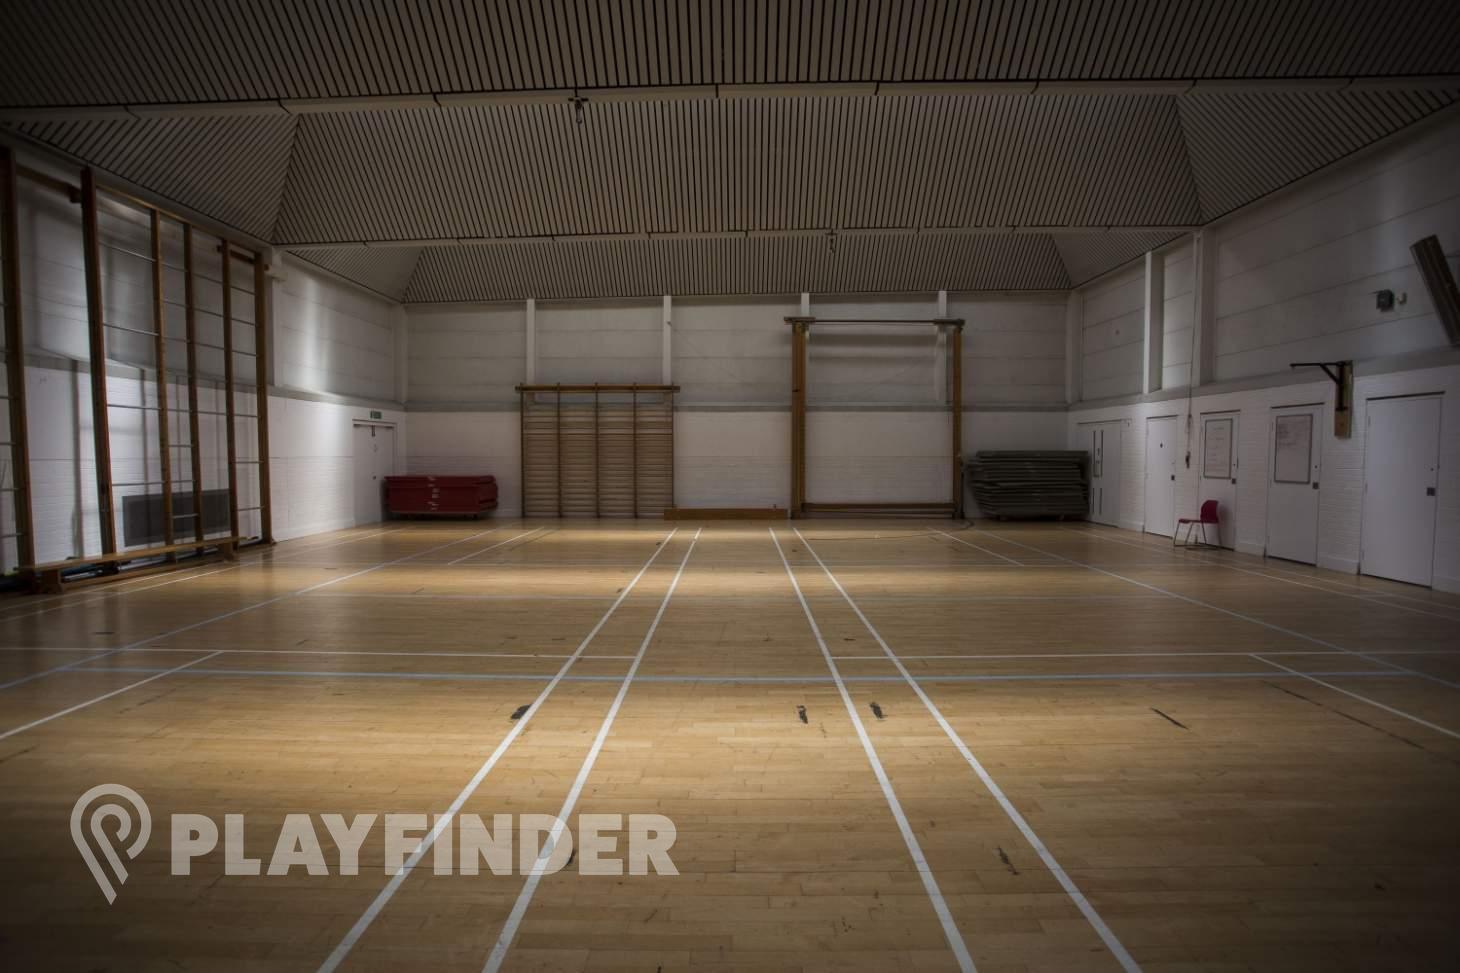 Acland Burghley School Indoor | Hard badminton court